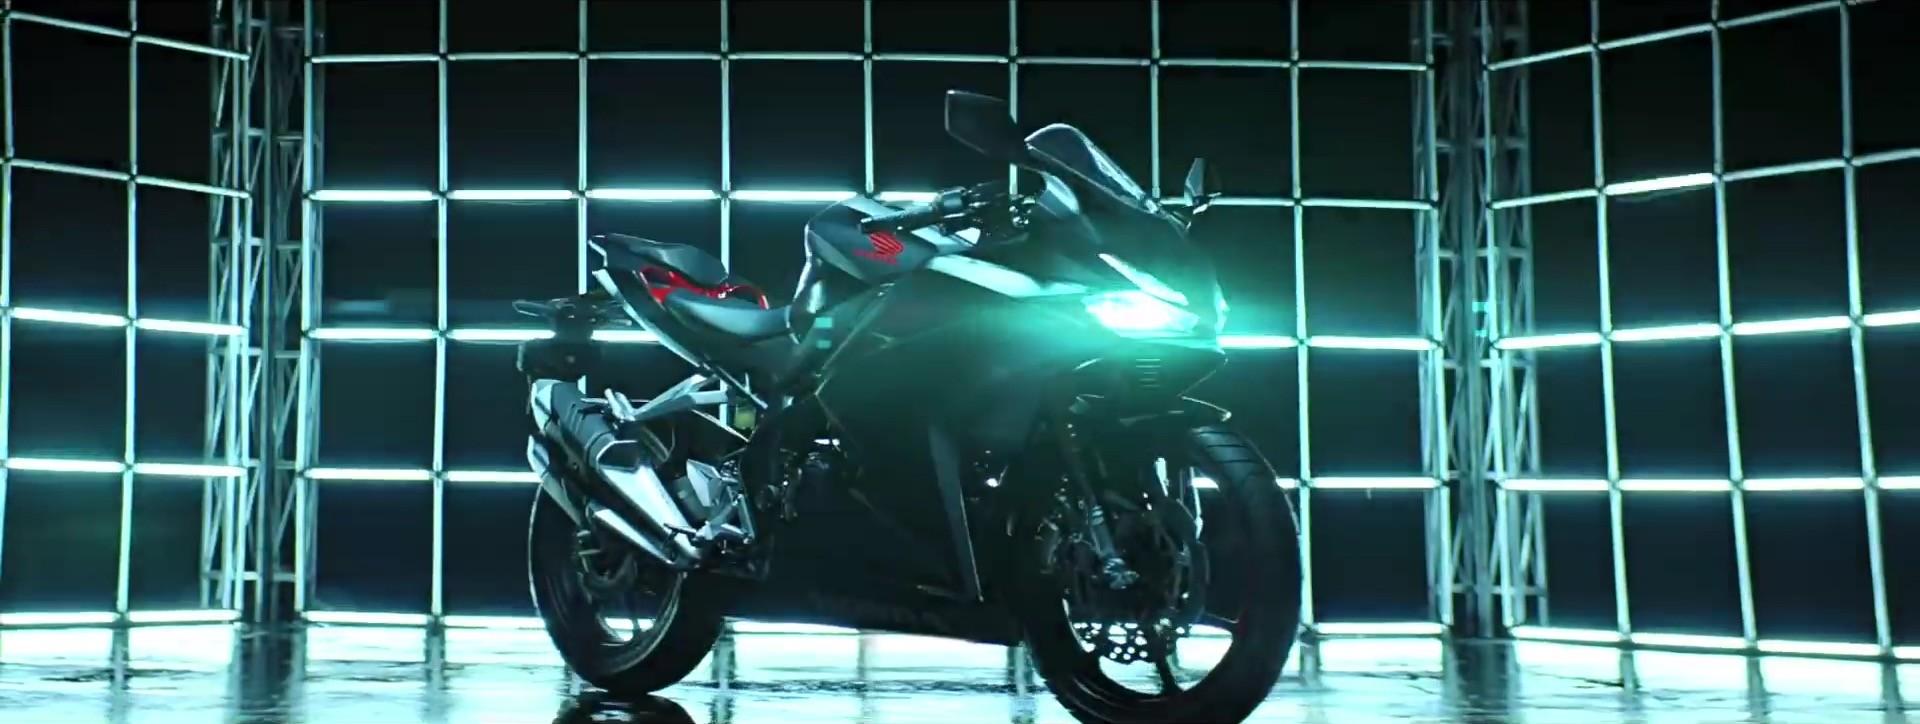 New Honda CBR250RR Fully Unveiled in Indonesia - autoevolution